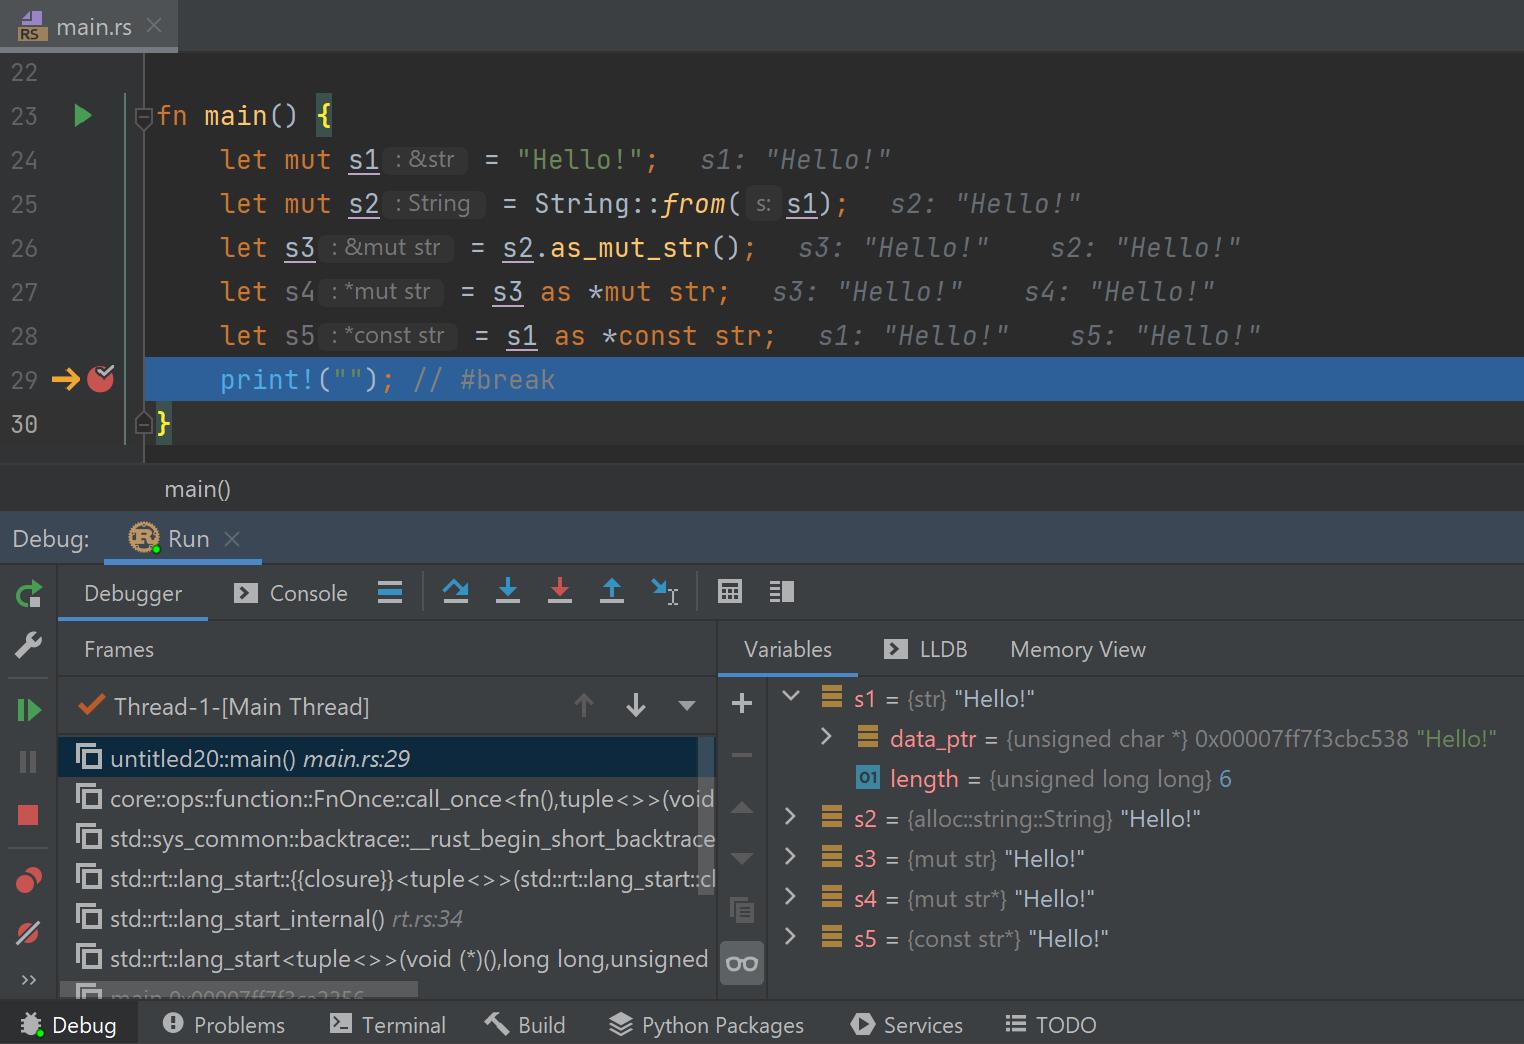 LLDB renderers for &str